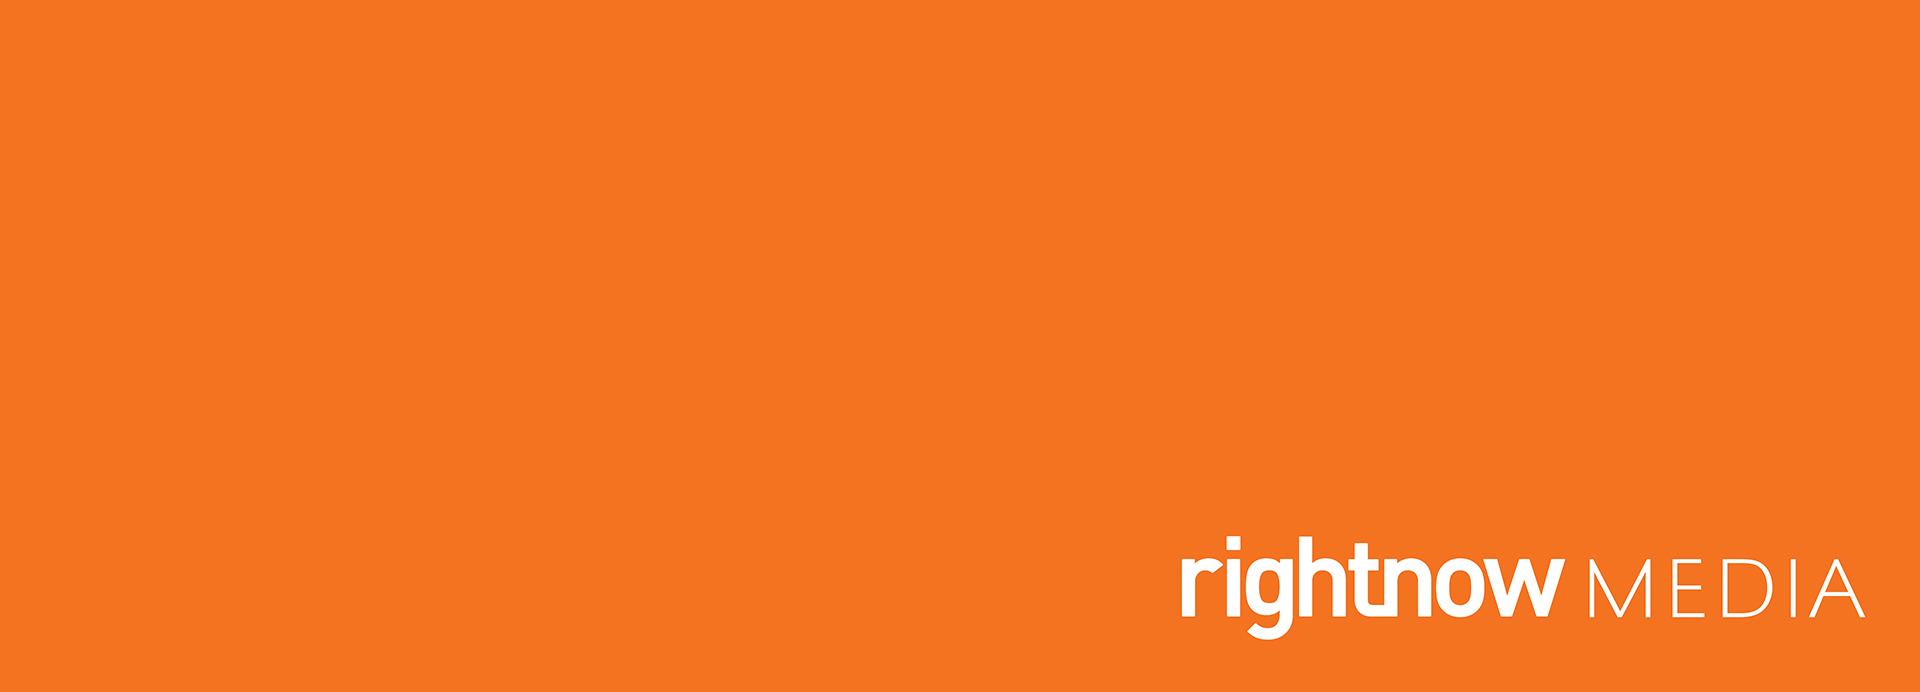 Rightnow Media -